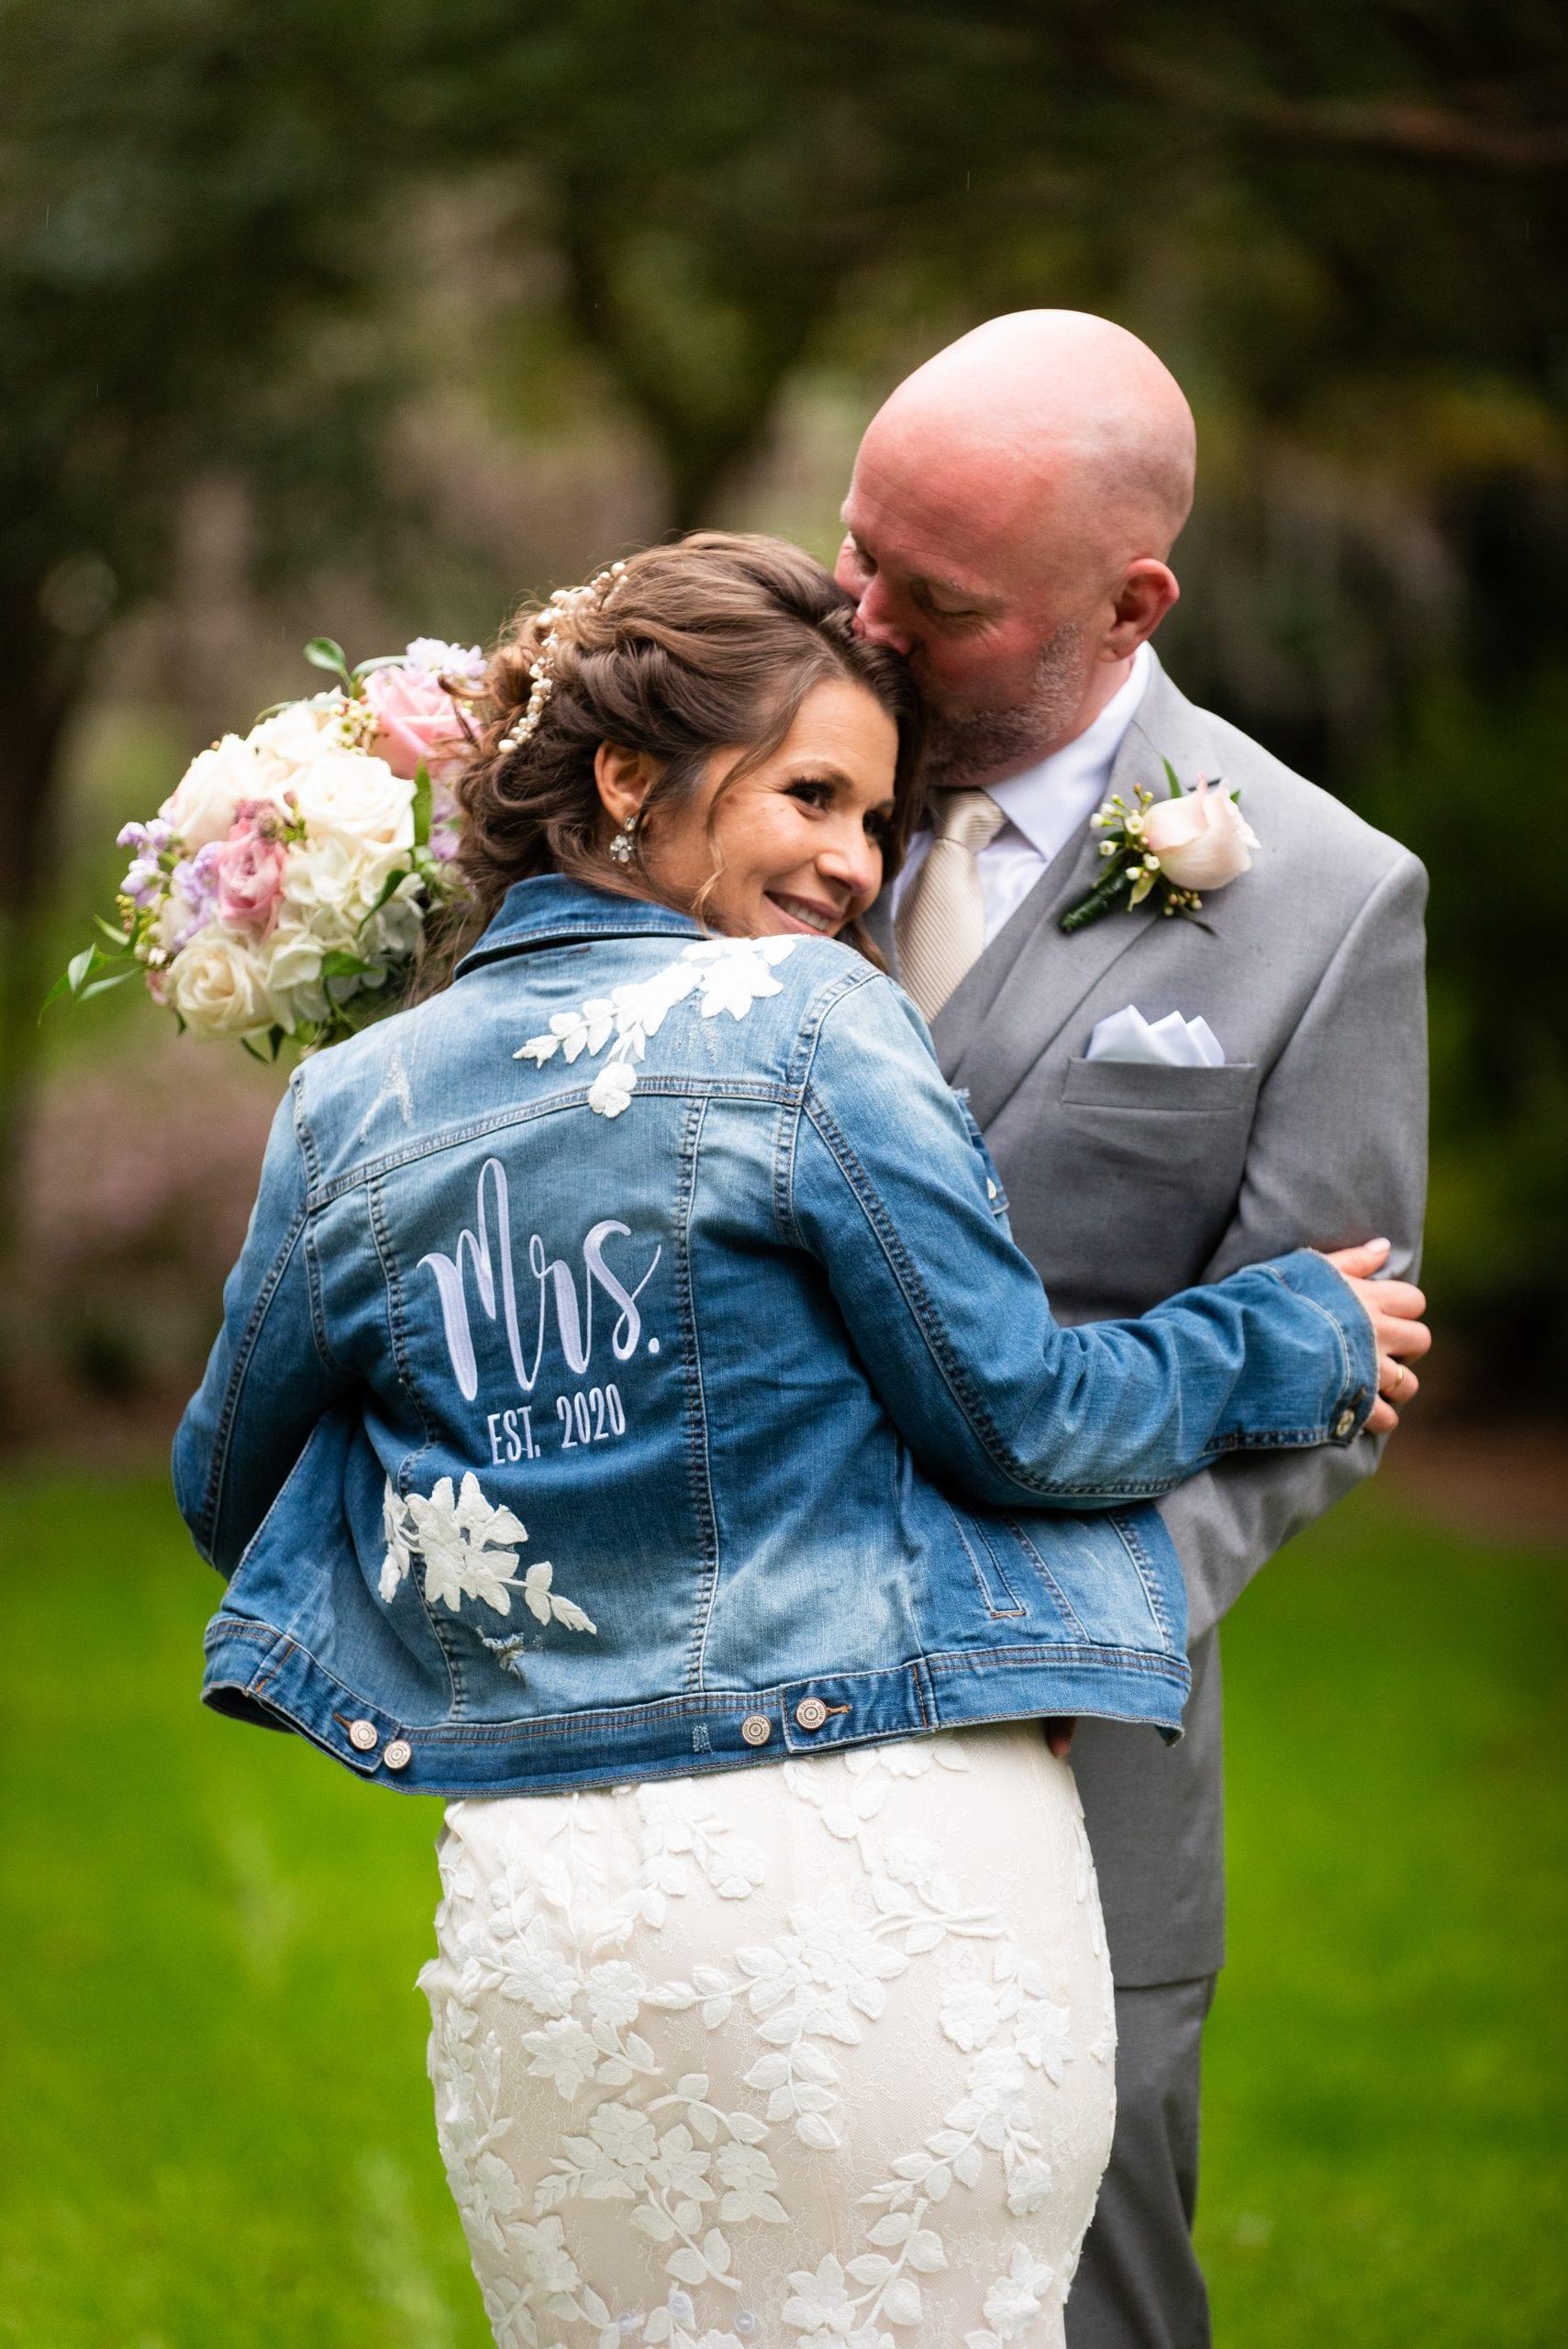 Nikki + Denny's Dusty Rose and Mauve Wedding